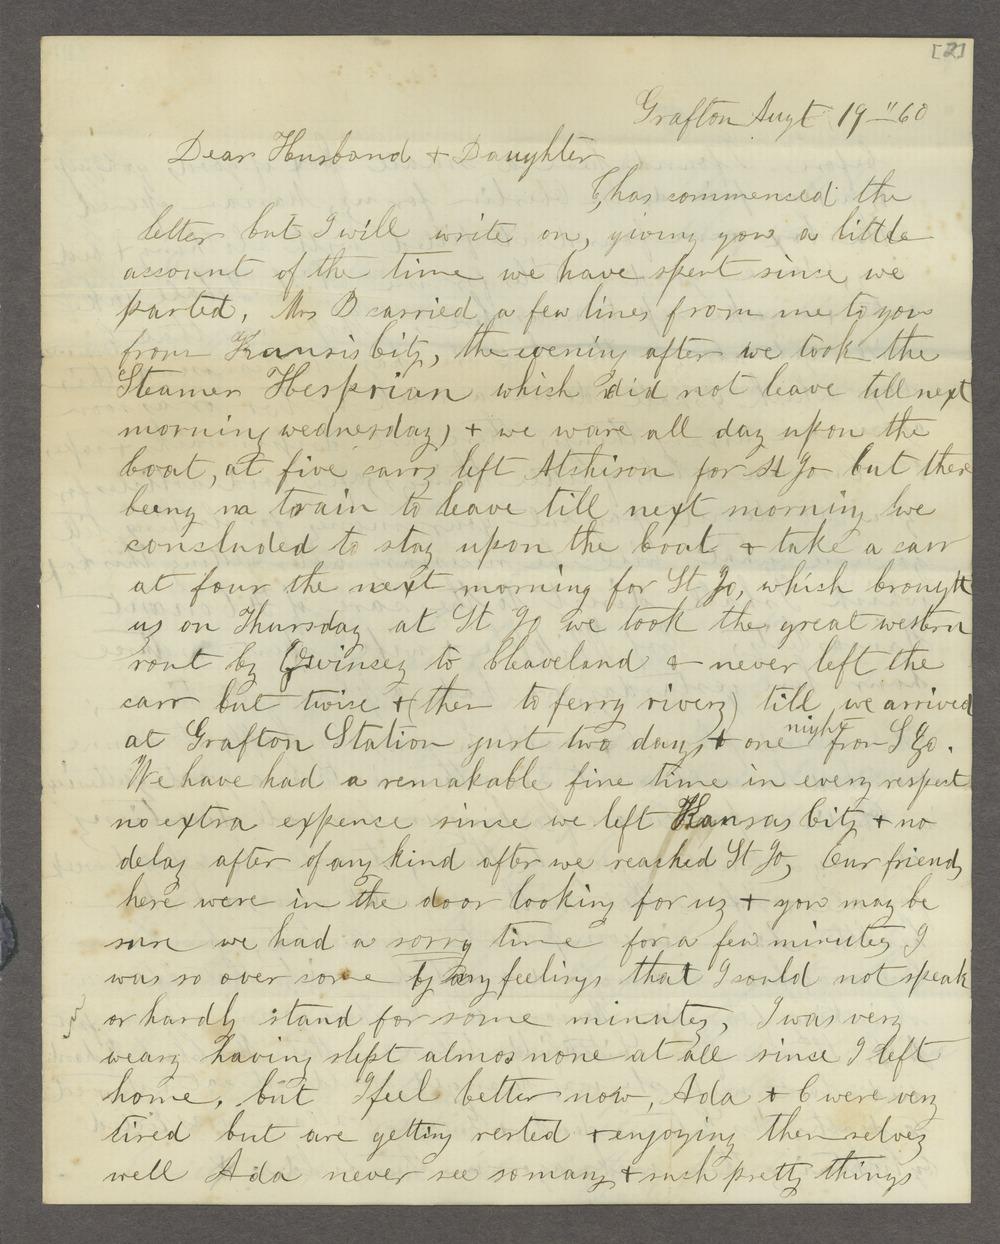 Correspondence between Samuel Lyle Adair, Florella Brown Adair, and their children - 3